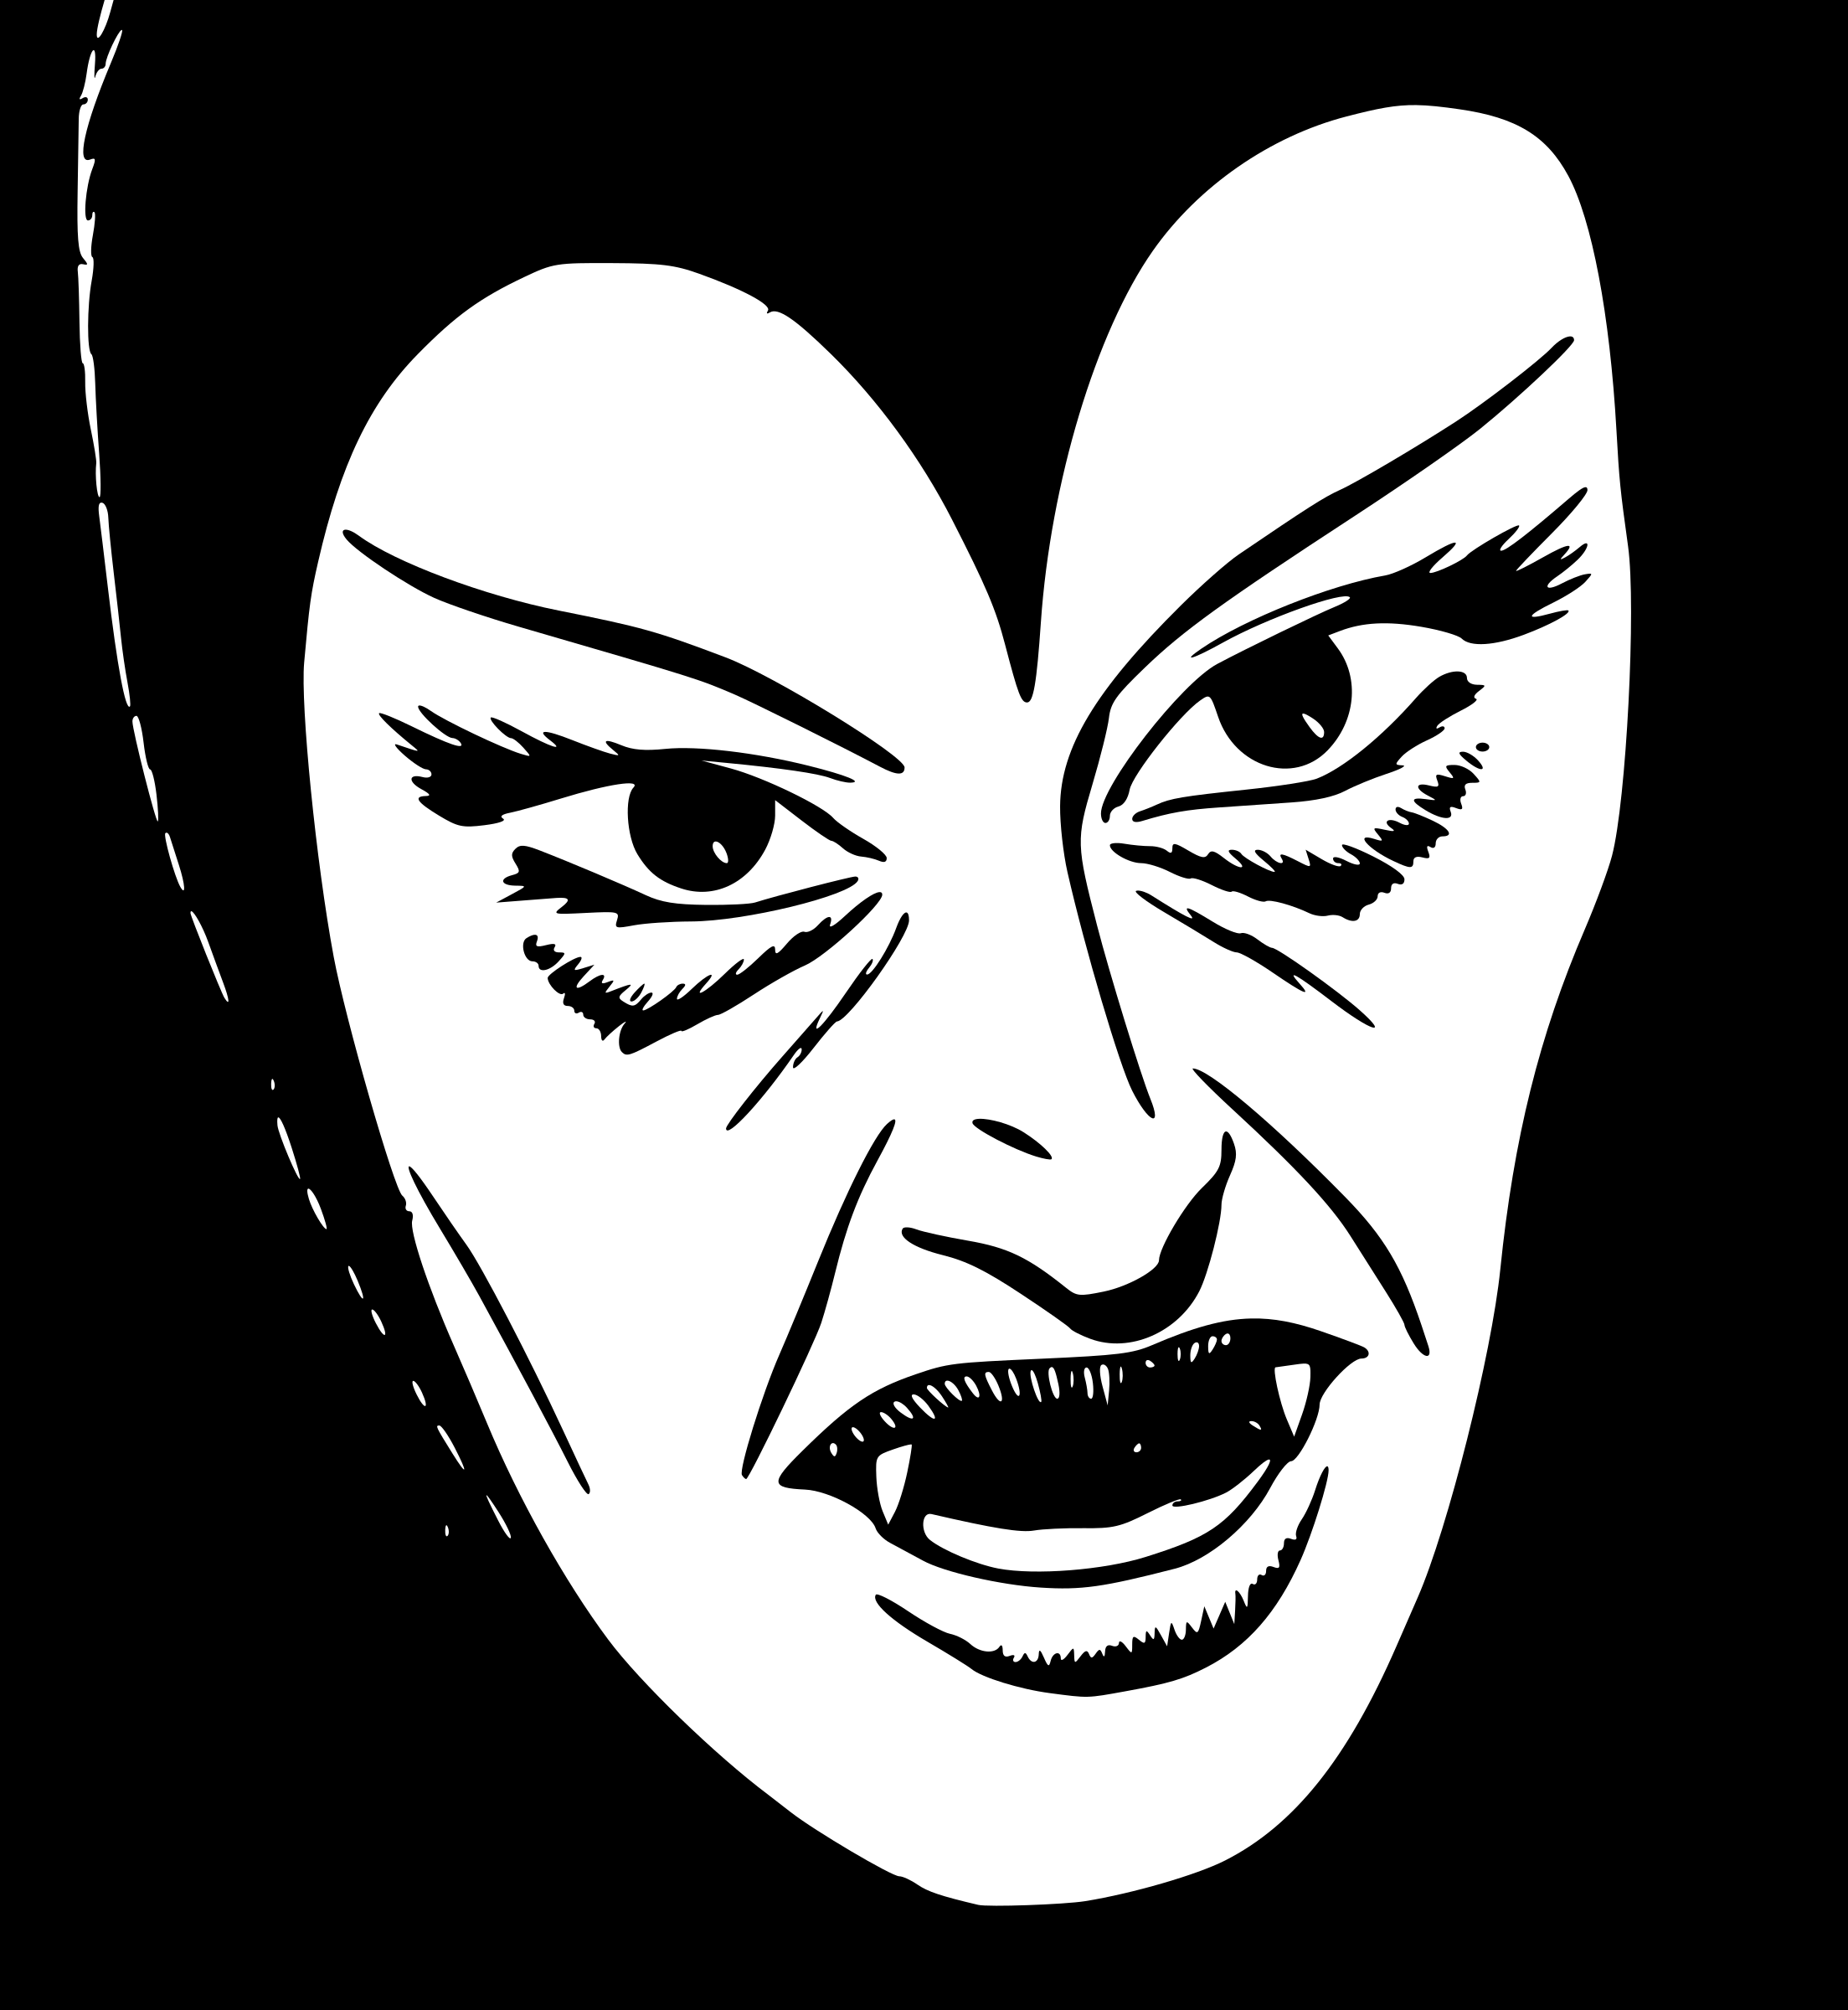 Female Vampire Face Vector Clipart Image Free Stock Photo